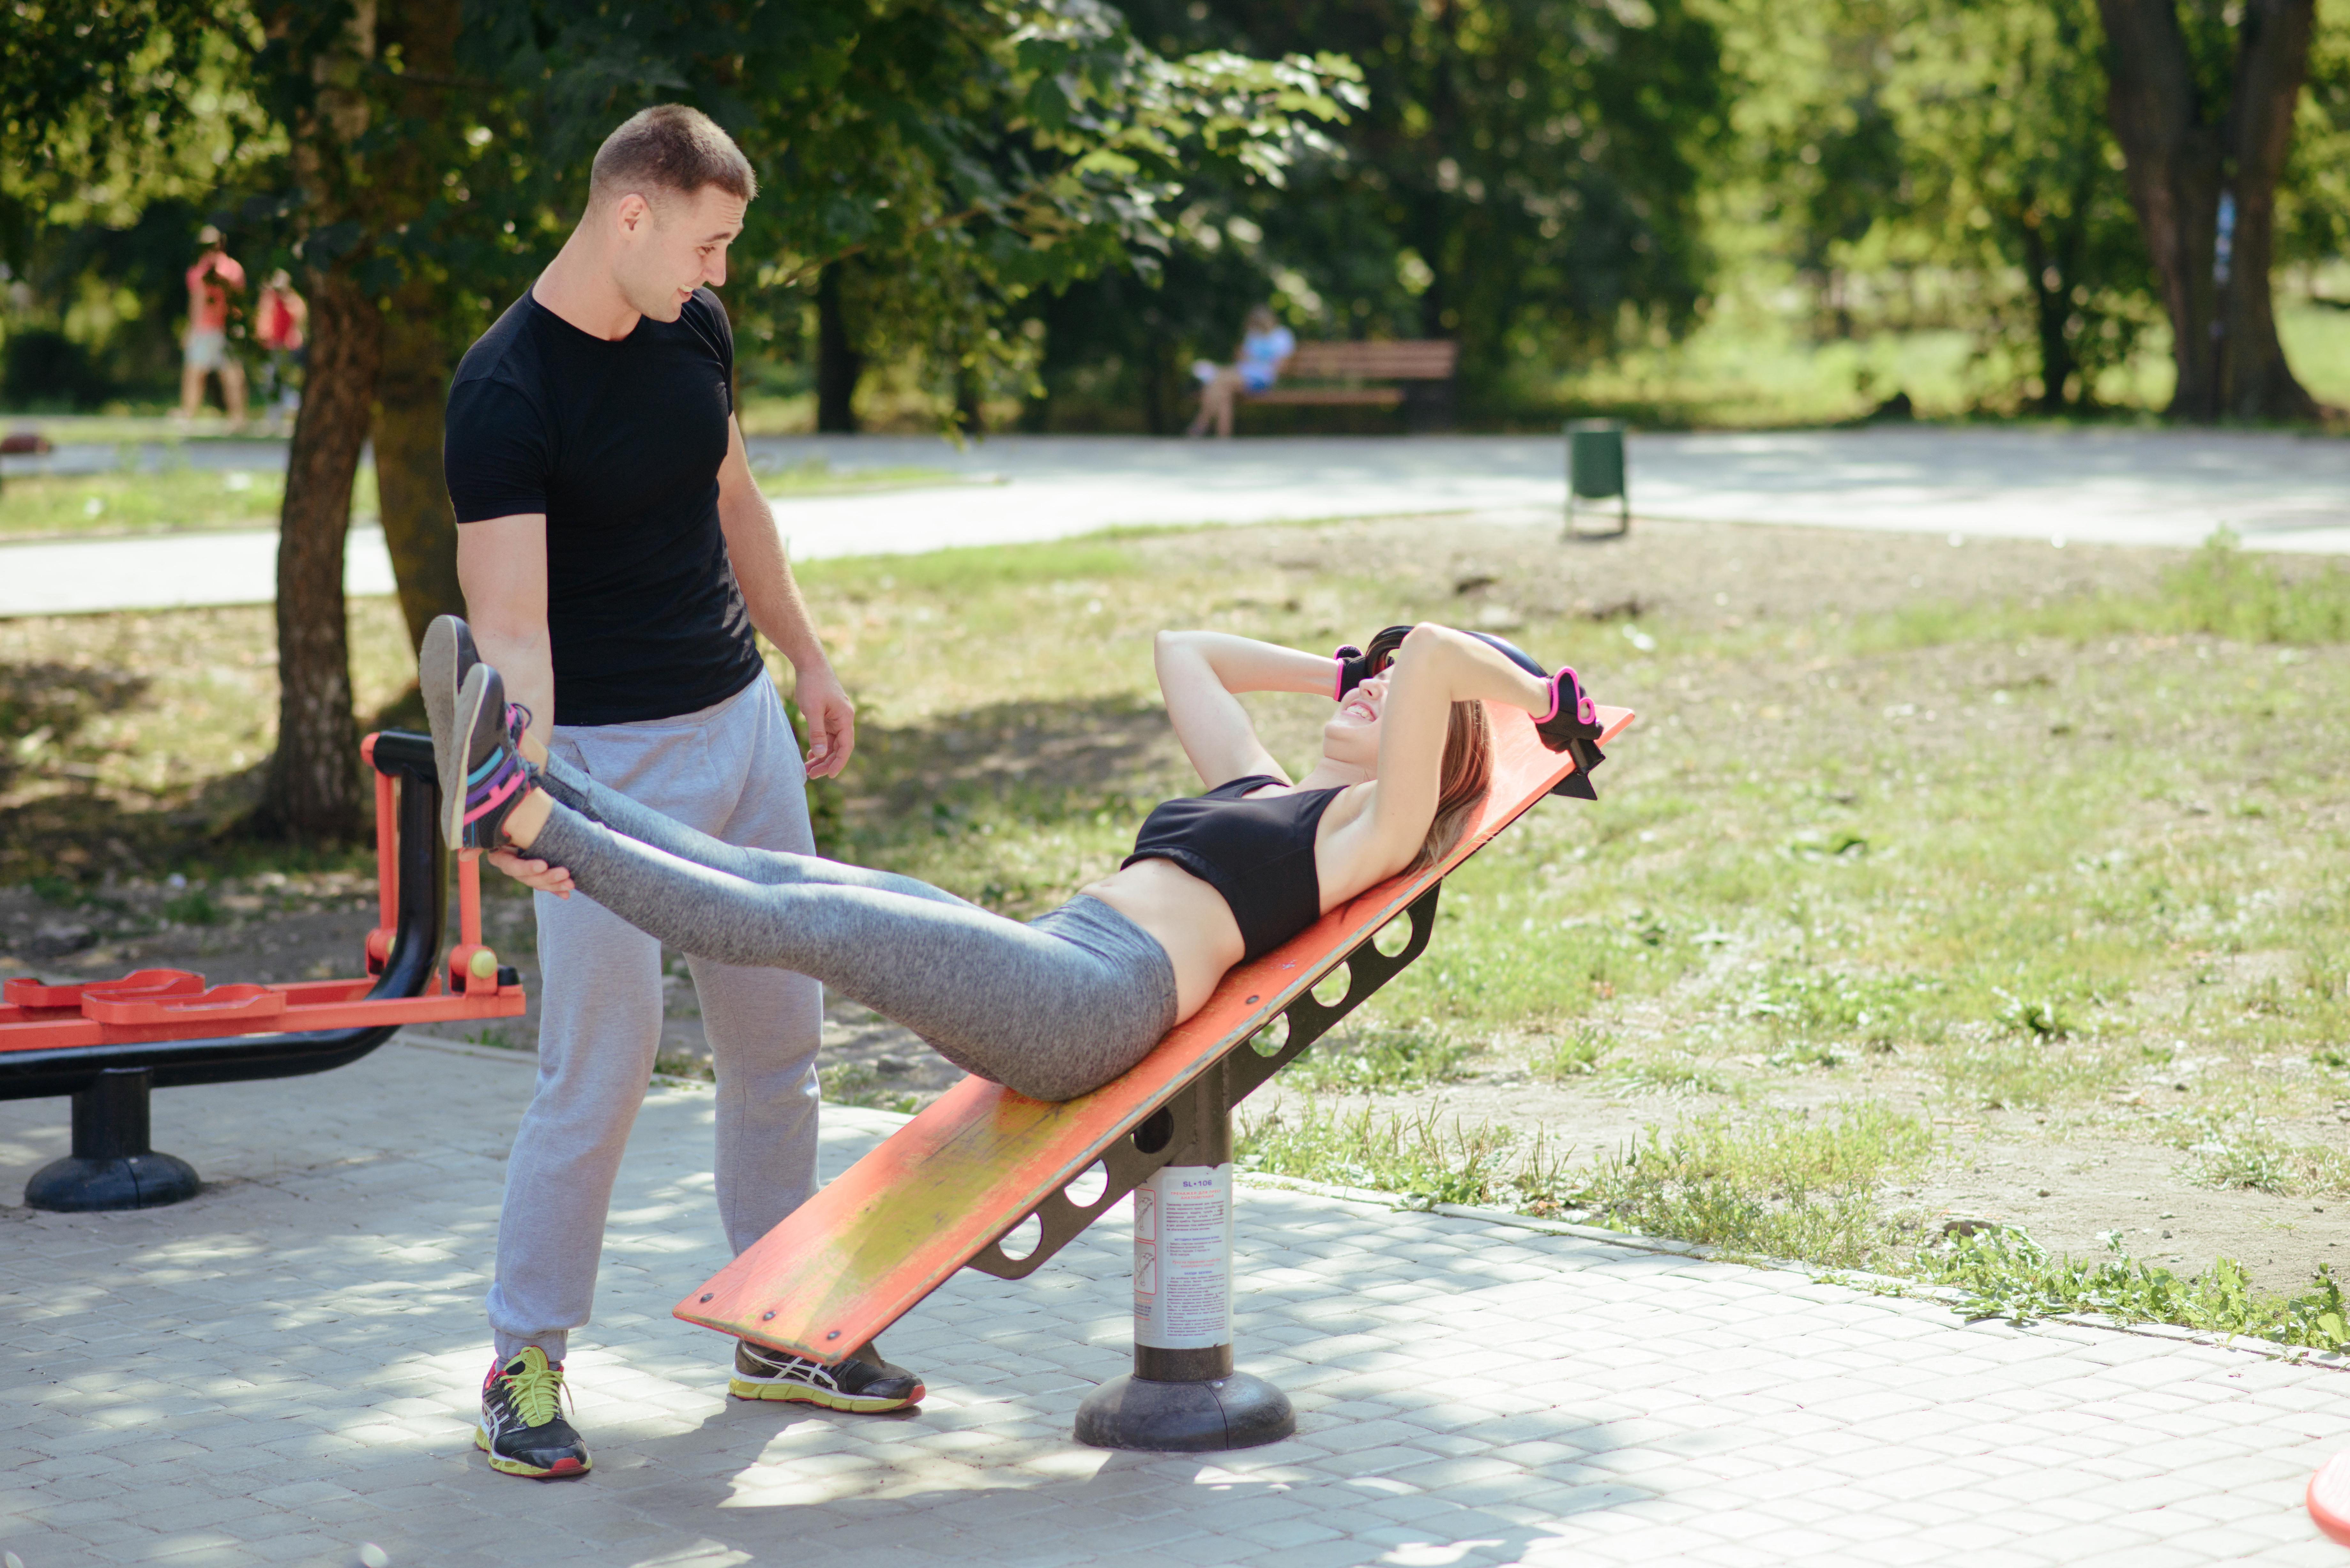 Plataforma disponibiliza mais de 700 personal trainers